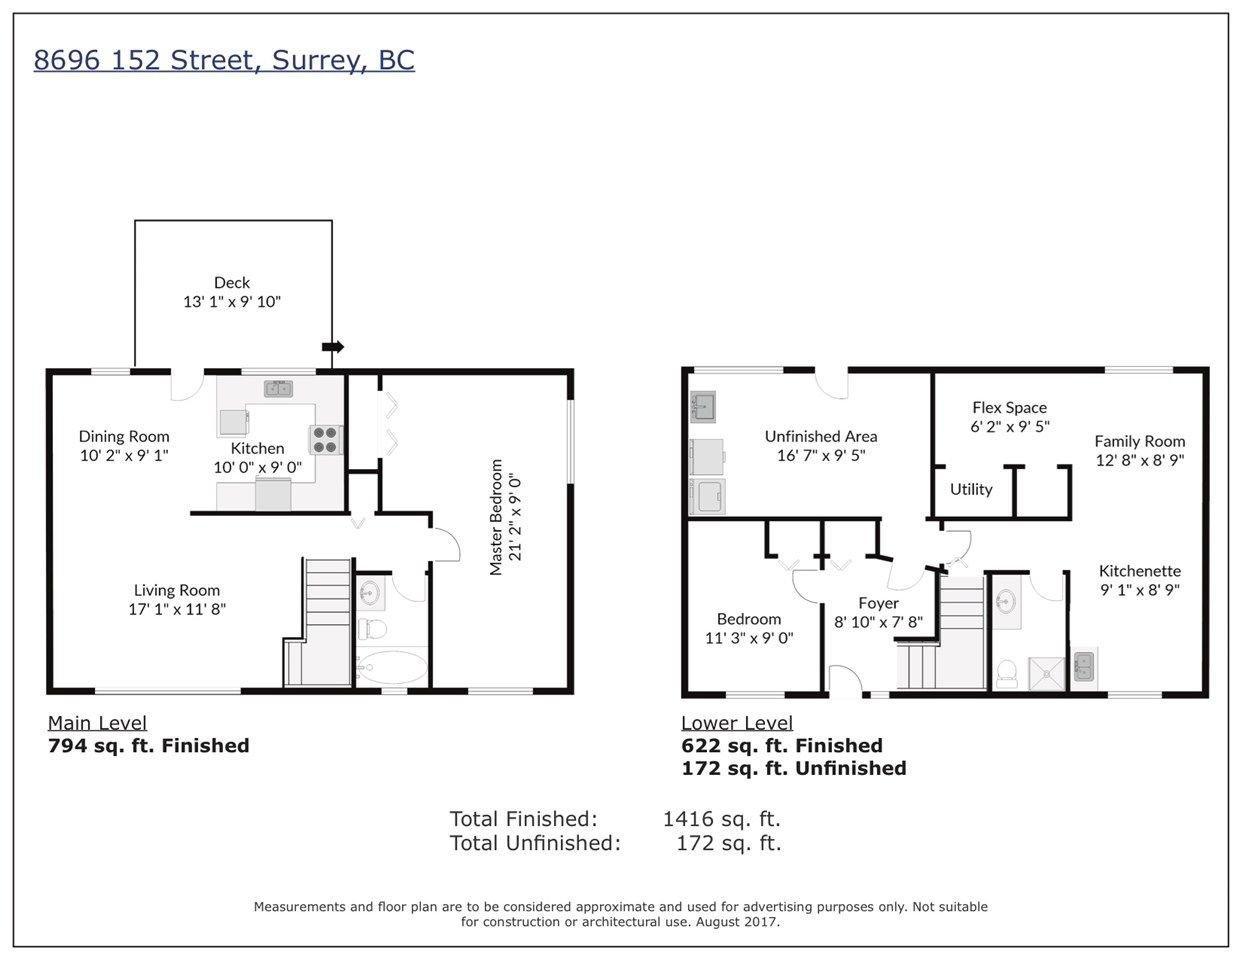 Main Photo: 8696 152 Street in Surrey: Fleetwood Tynehead House 1/2 Duplex for sale : MLS®# R2223045